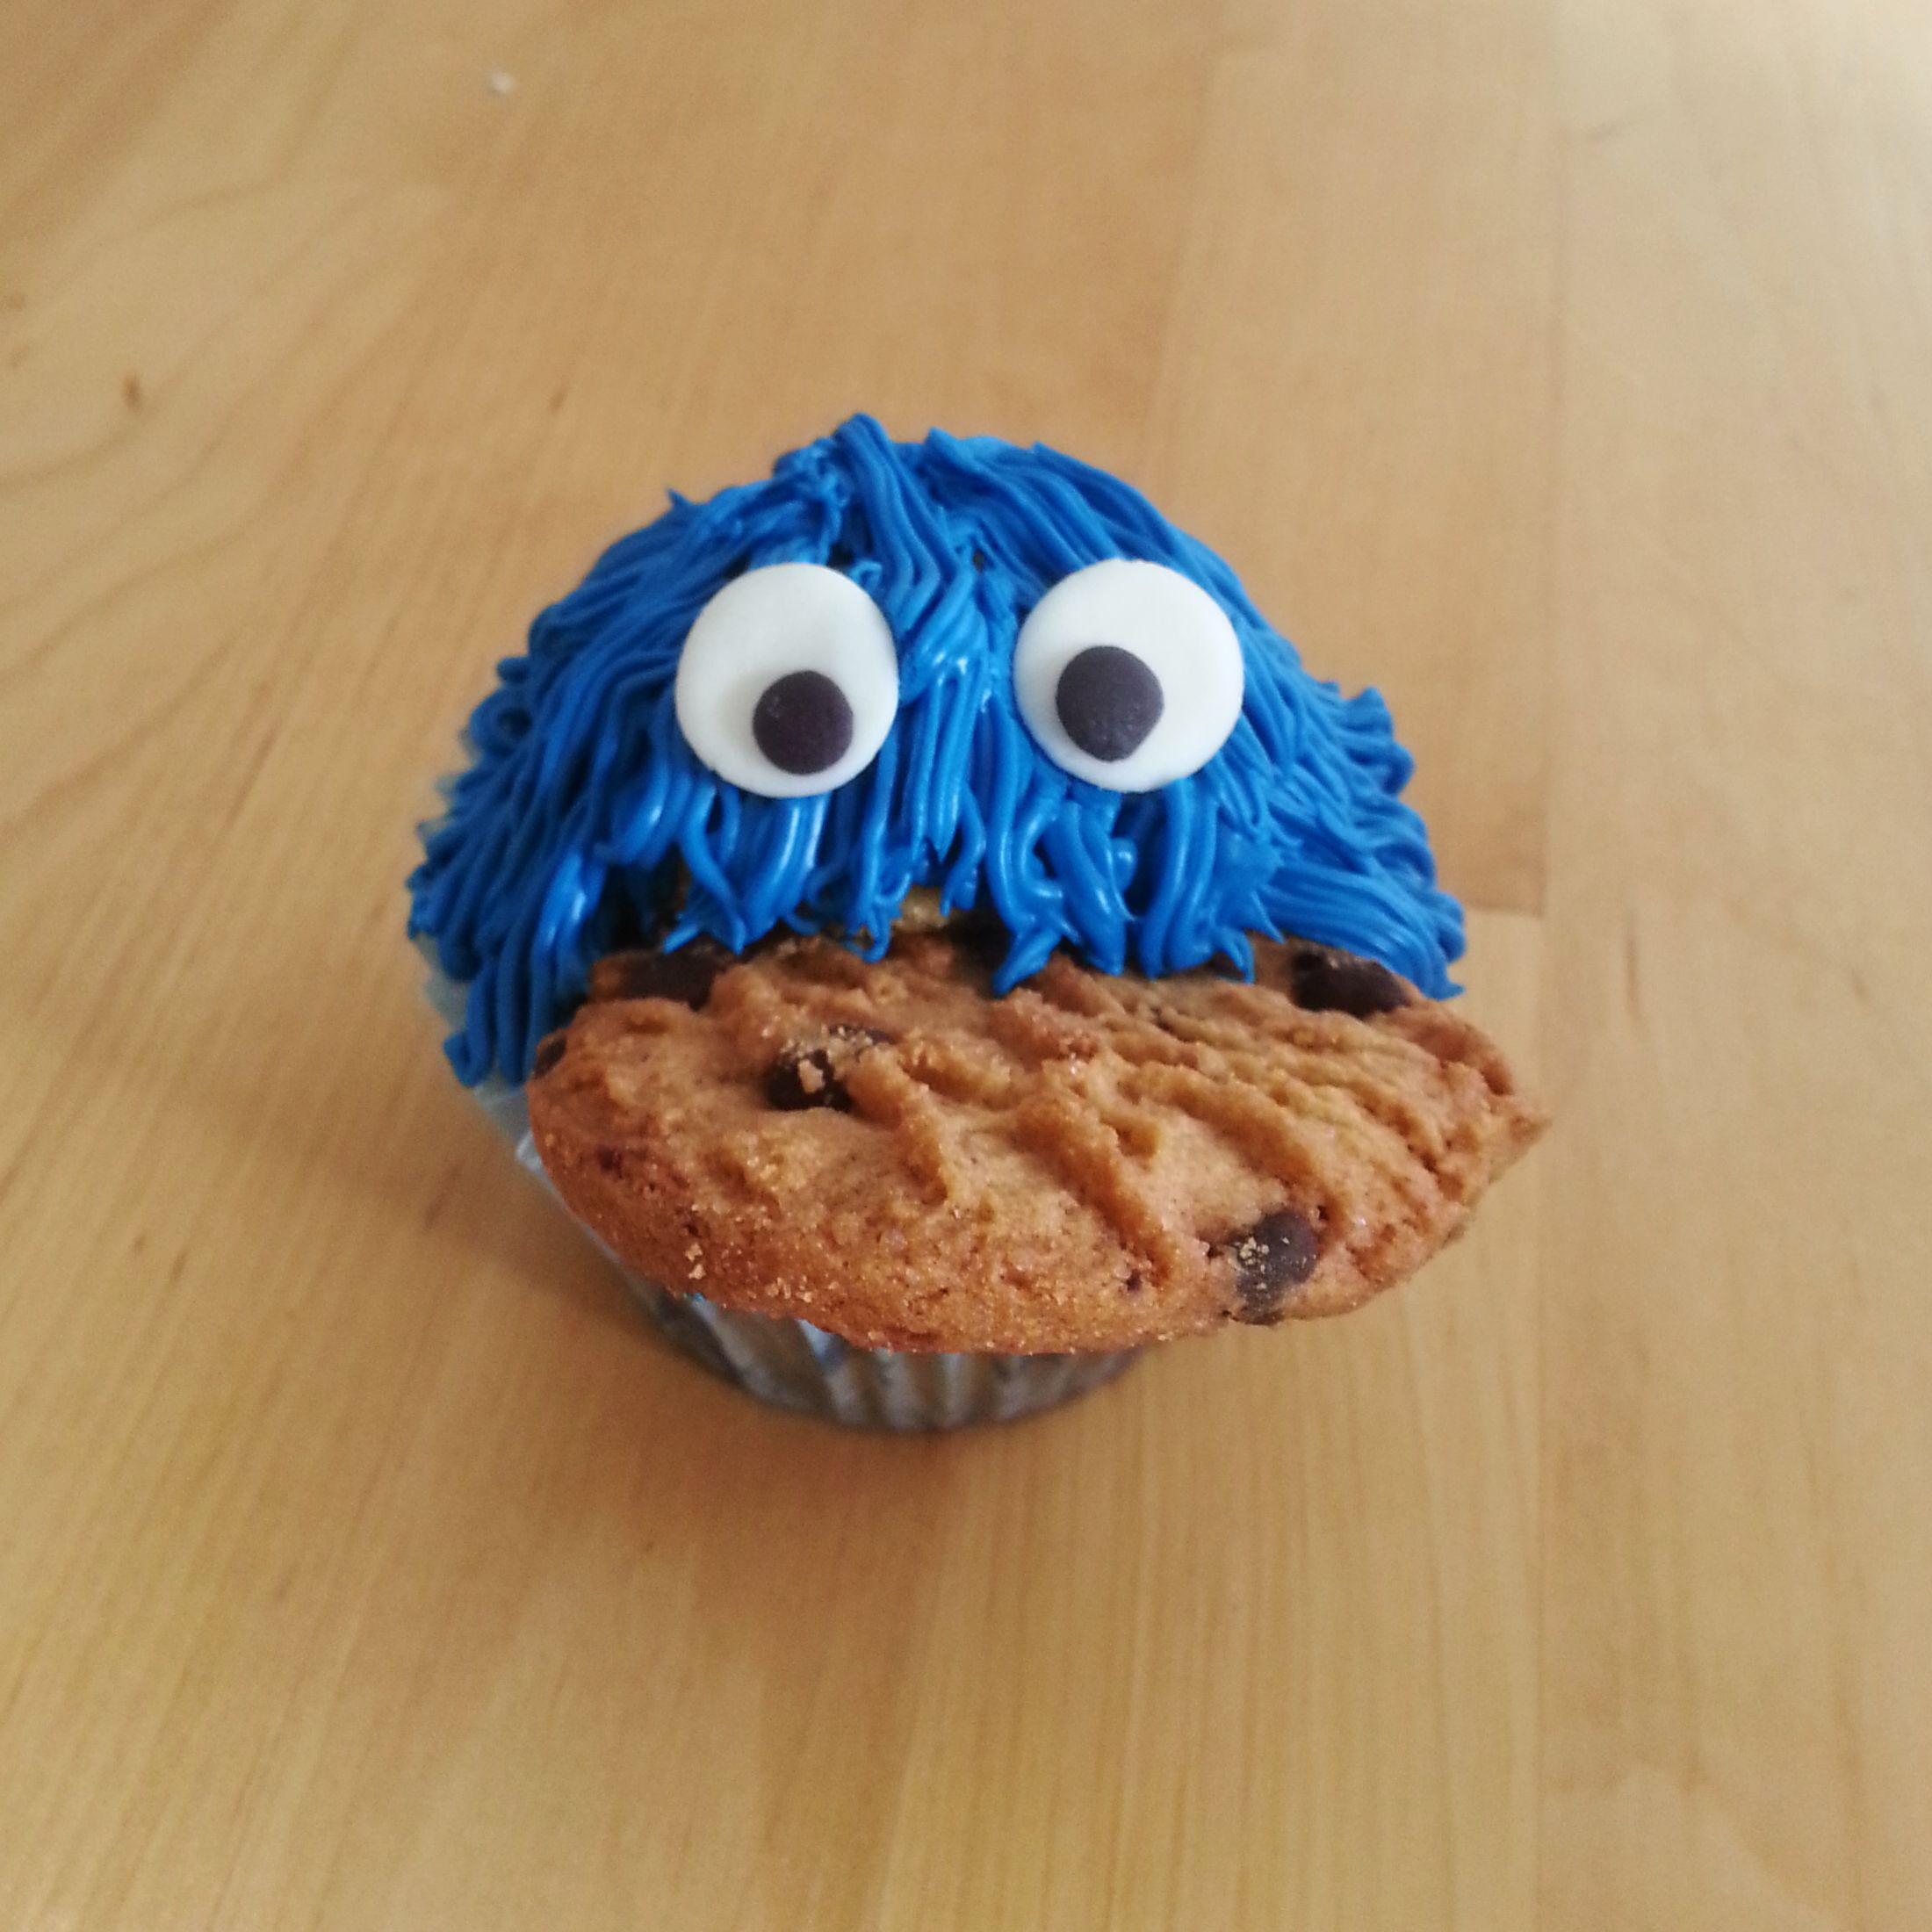 Coockiemonster Cupcake